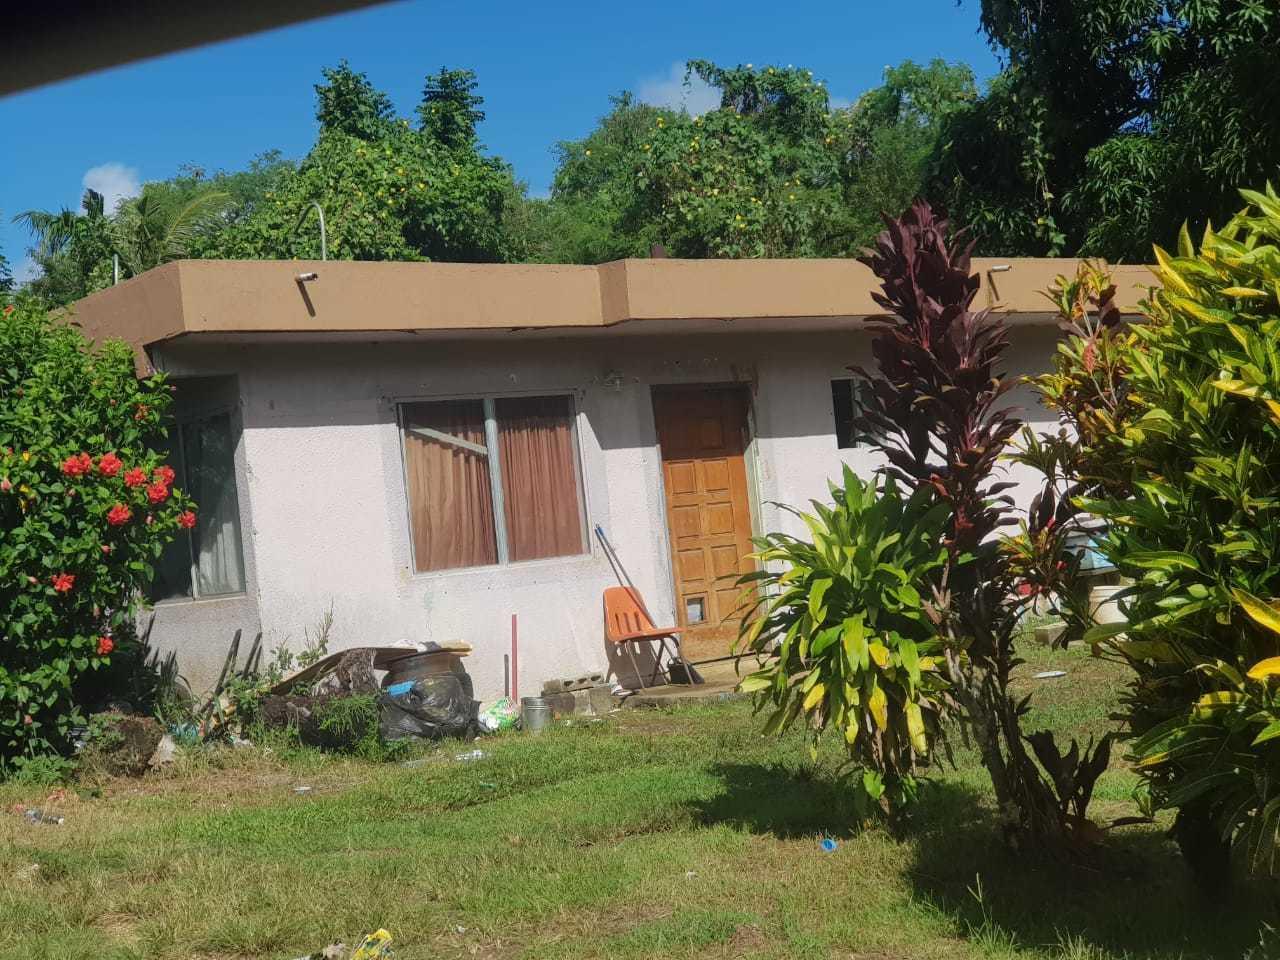 124 Aguon Street, Barrigada, GU 96913